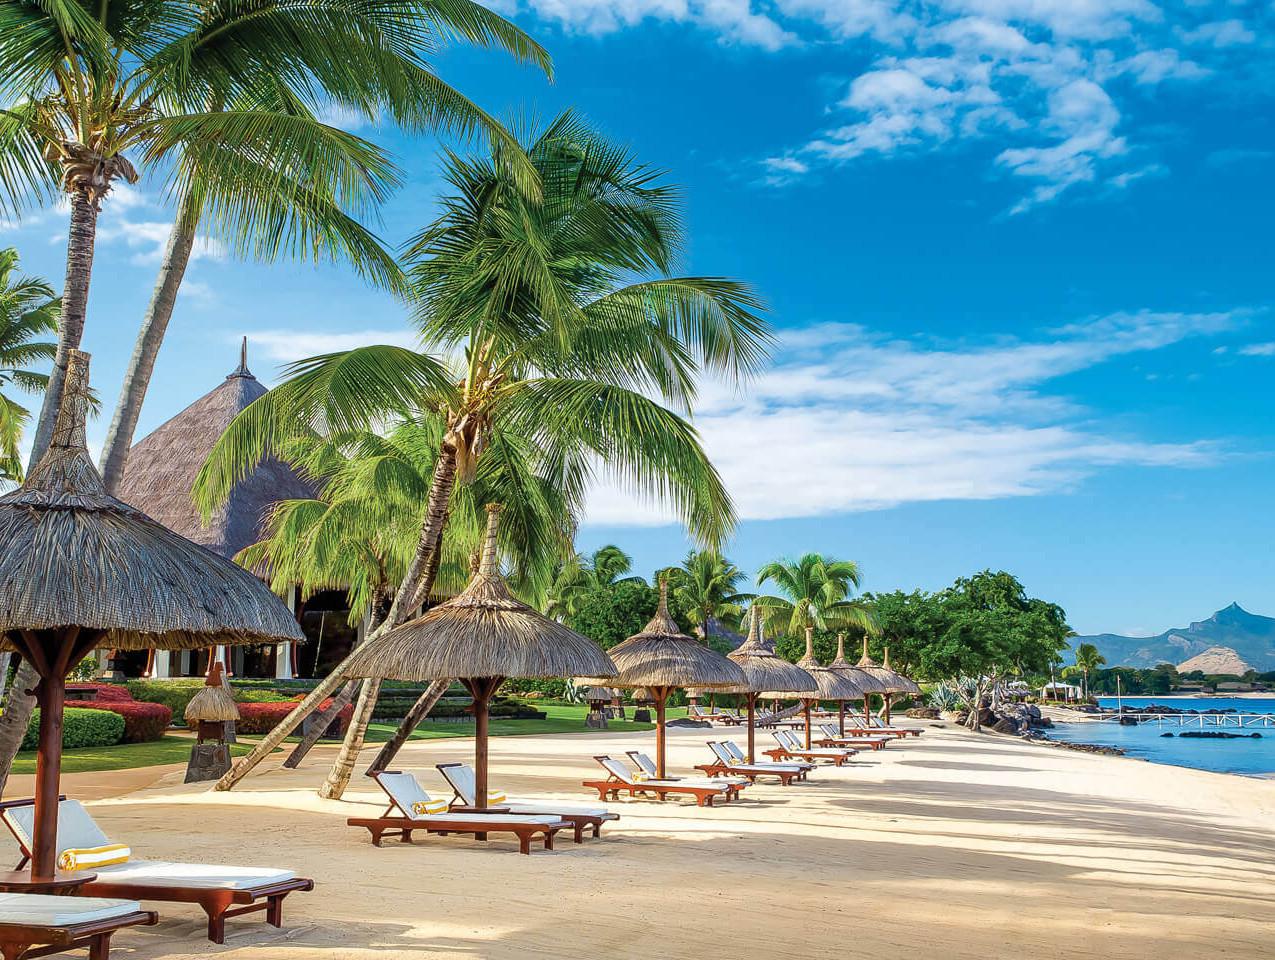 TOMU beach